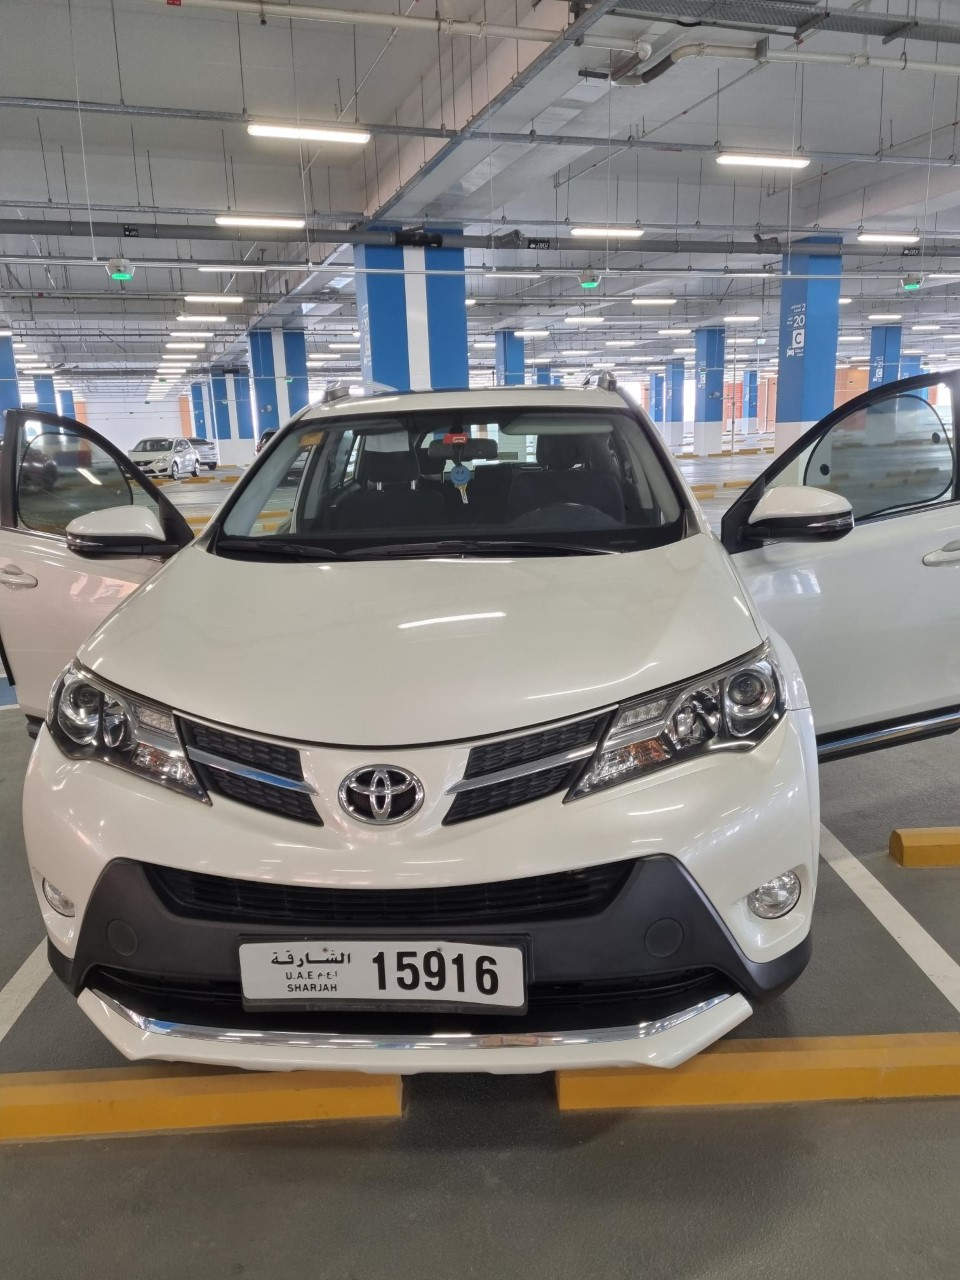 Toyota RAV4 GXR 4WD 2015 GCC - Image 6